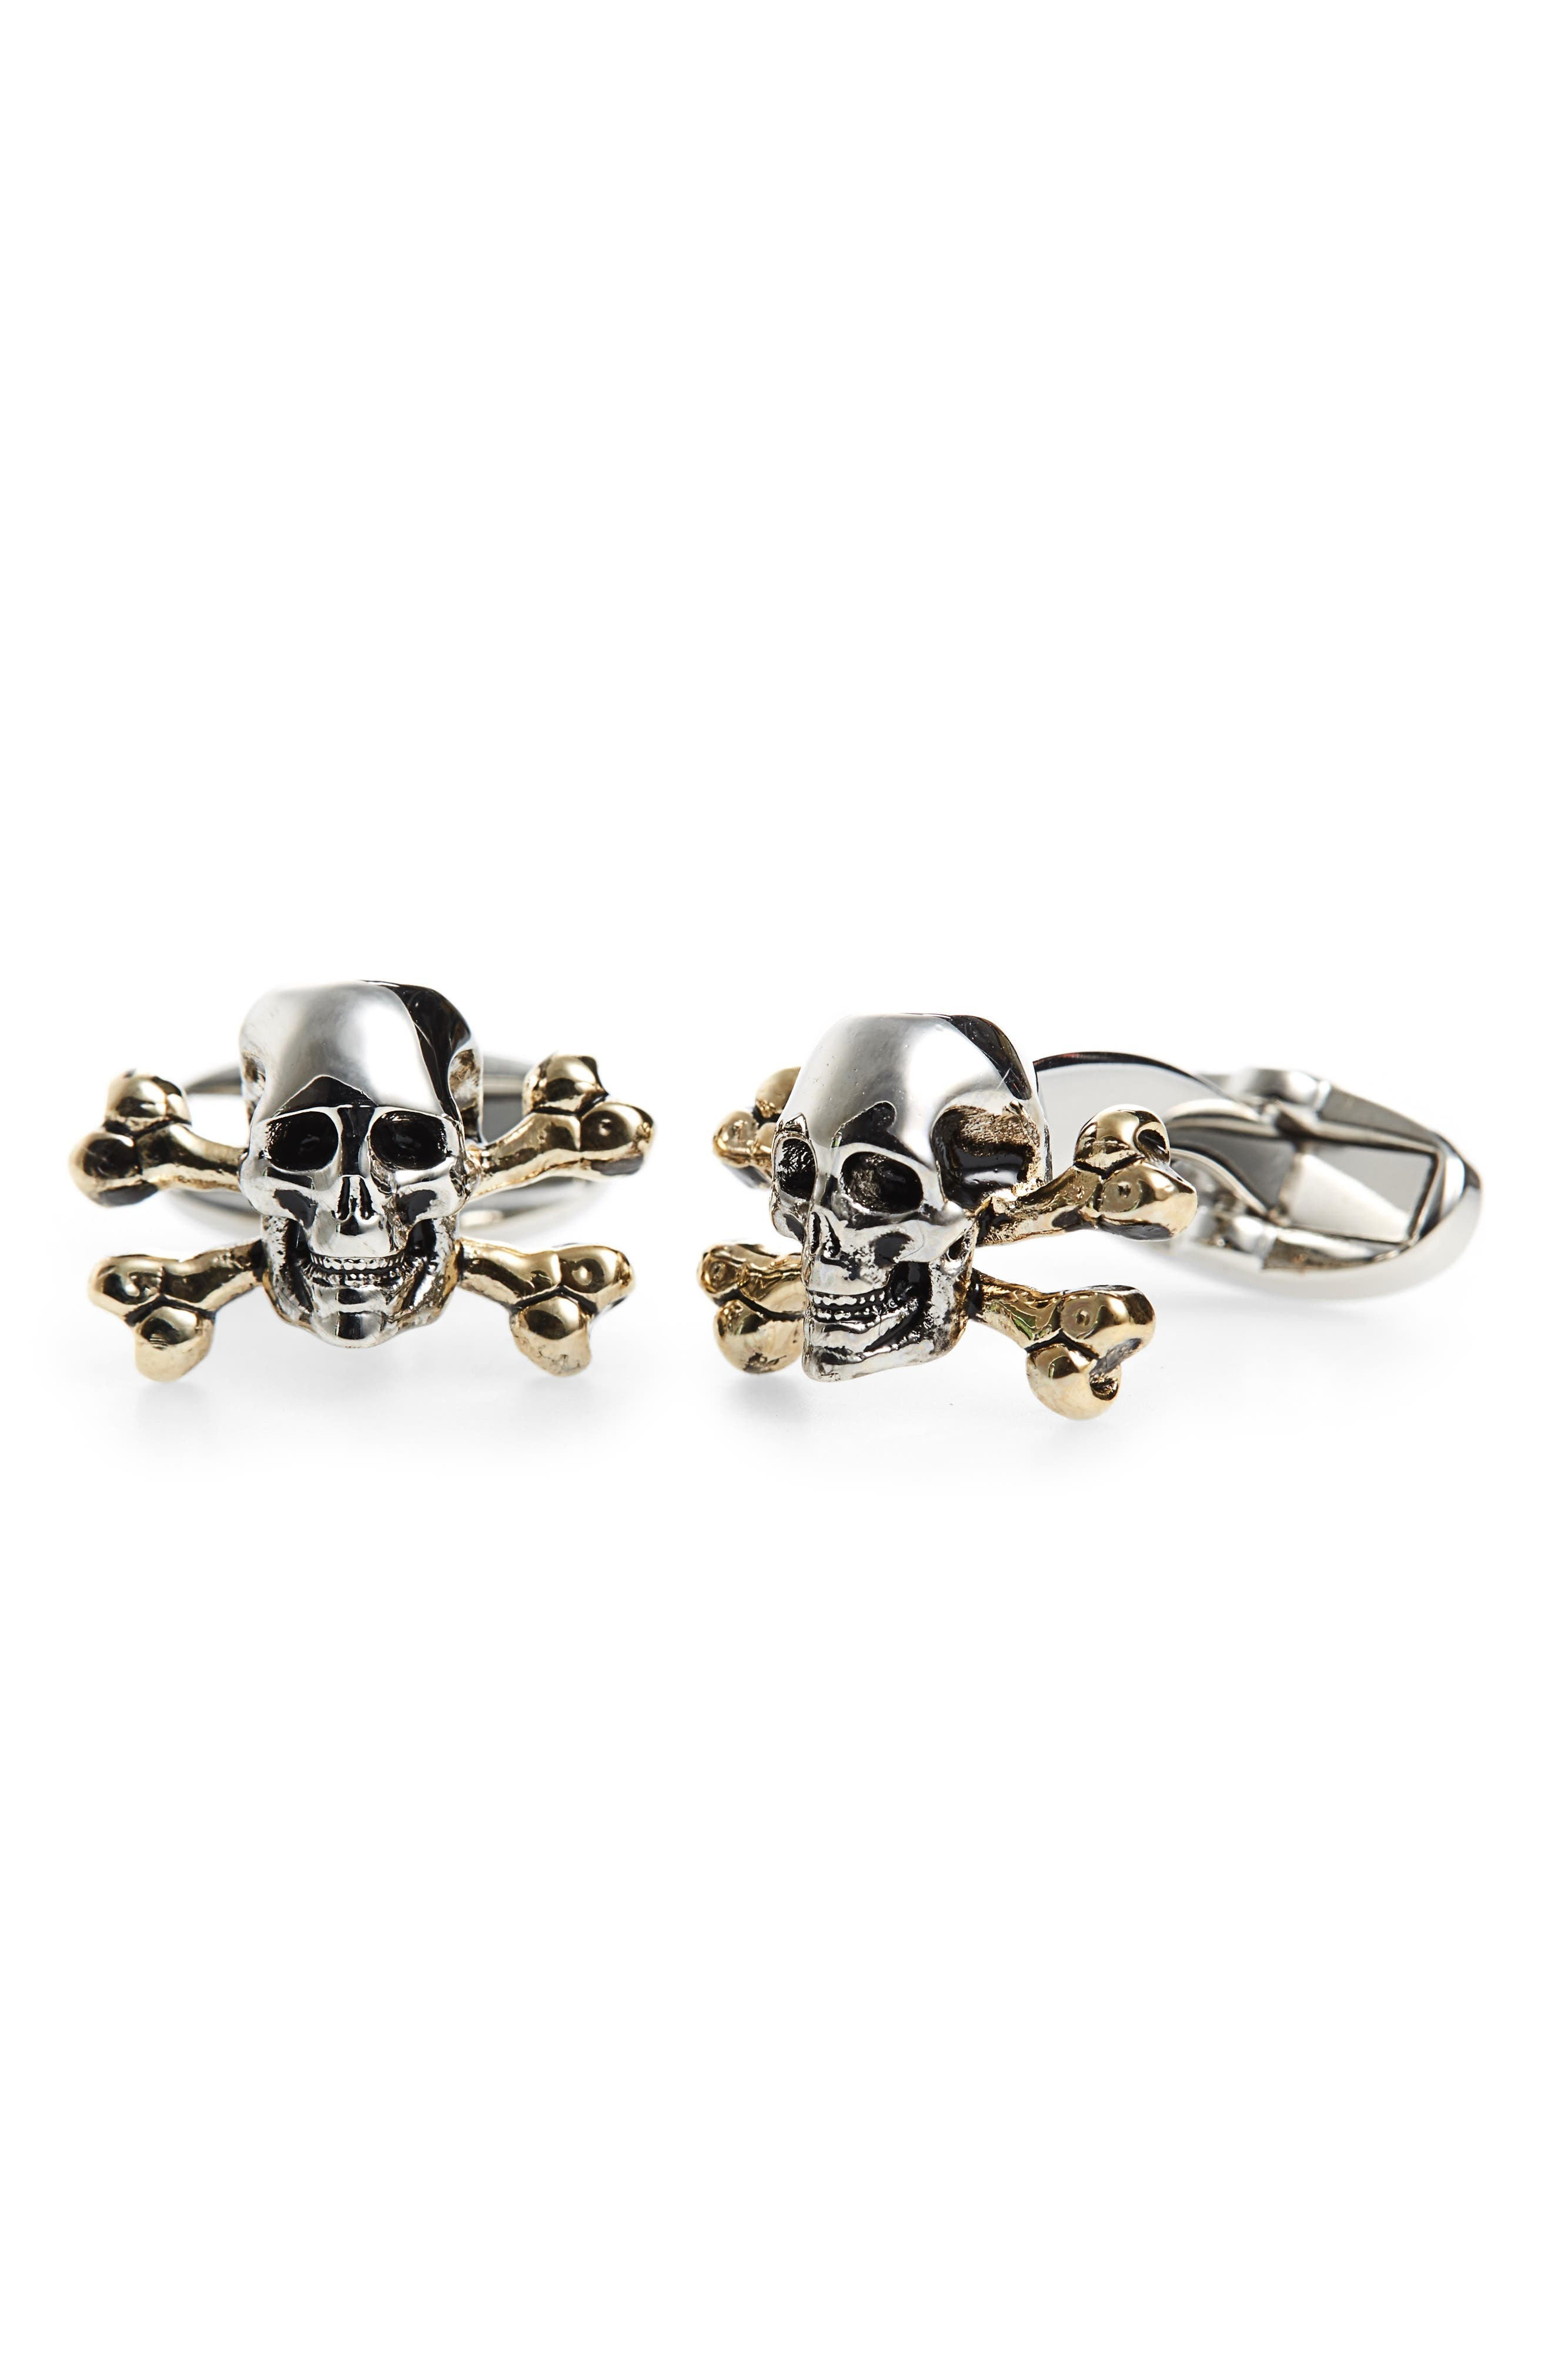 Alternate Image 1 Selected - Paul Smith Skull Cuff Links